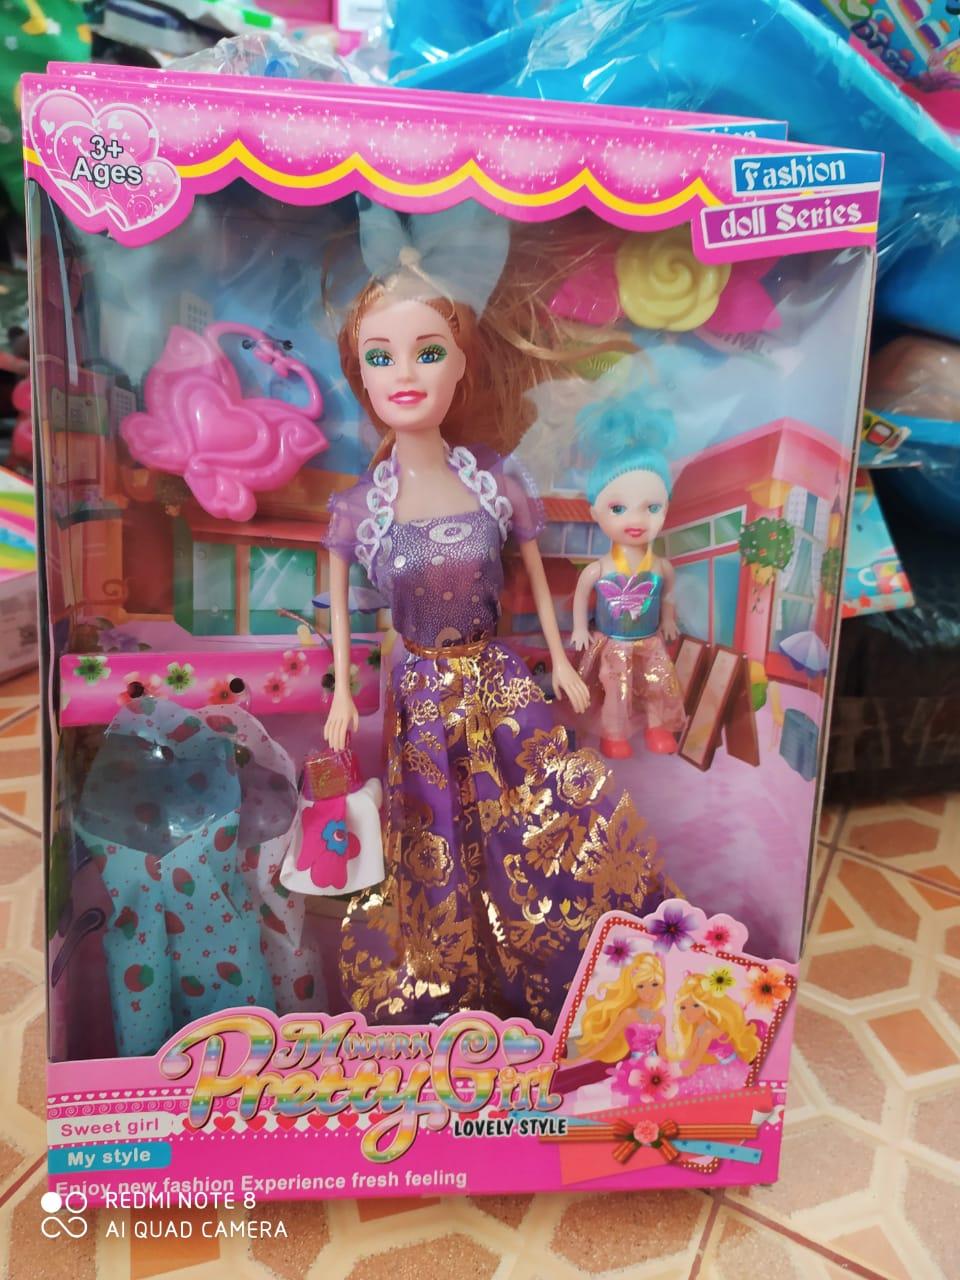 Free 2 Pcs Gantungan Kunci Mainan Anak Perempuan Boneka Barbie Modern Pretty Girl Lovelly Style Lazada Indonesia